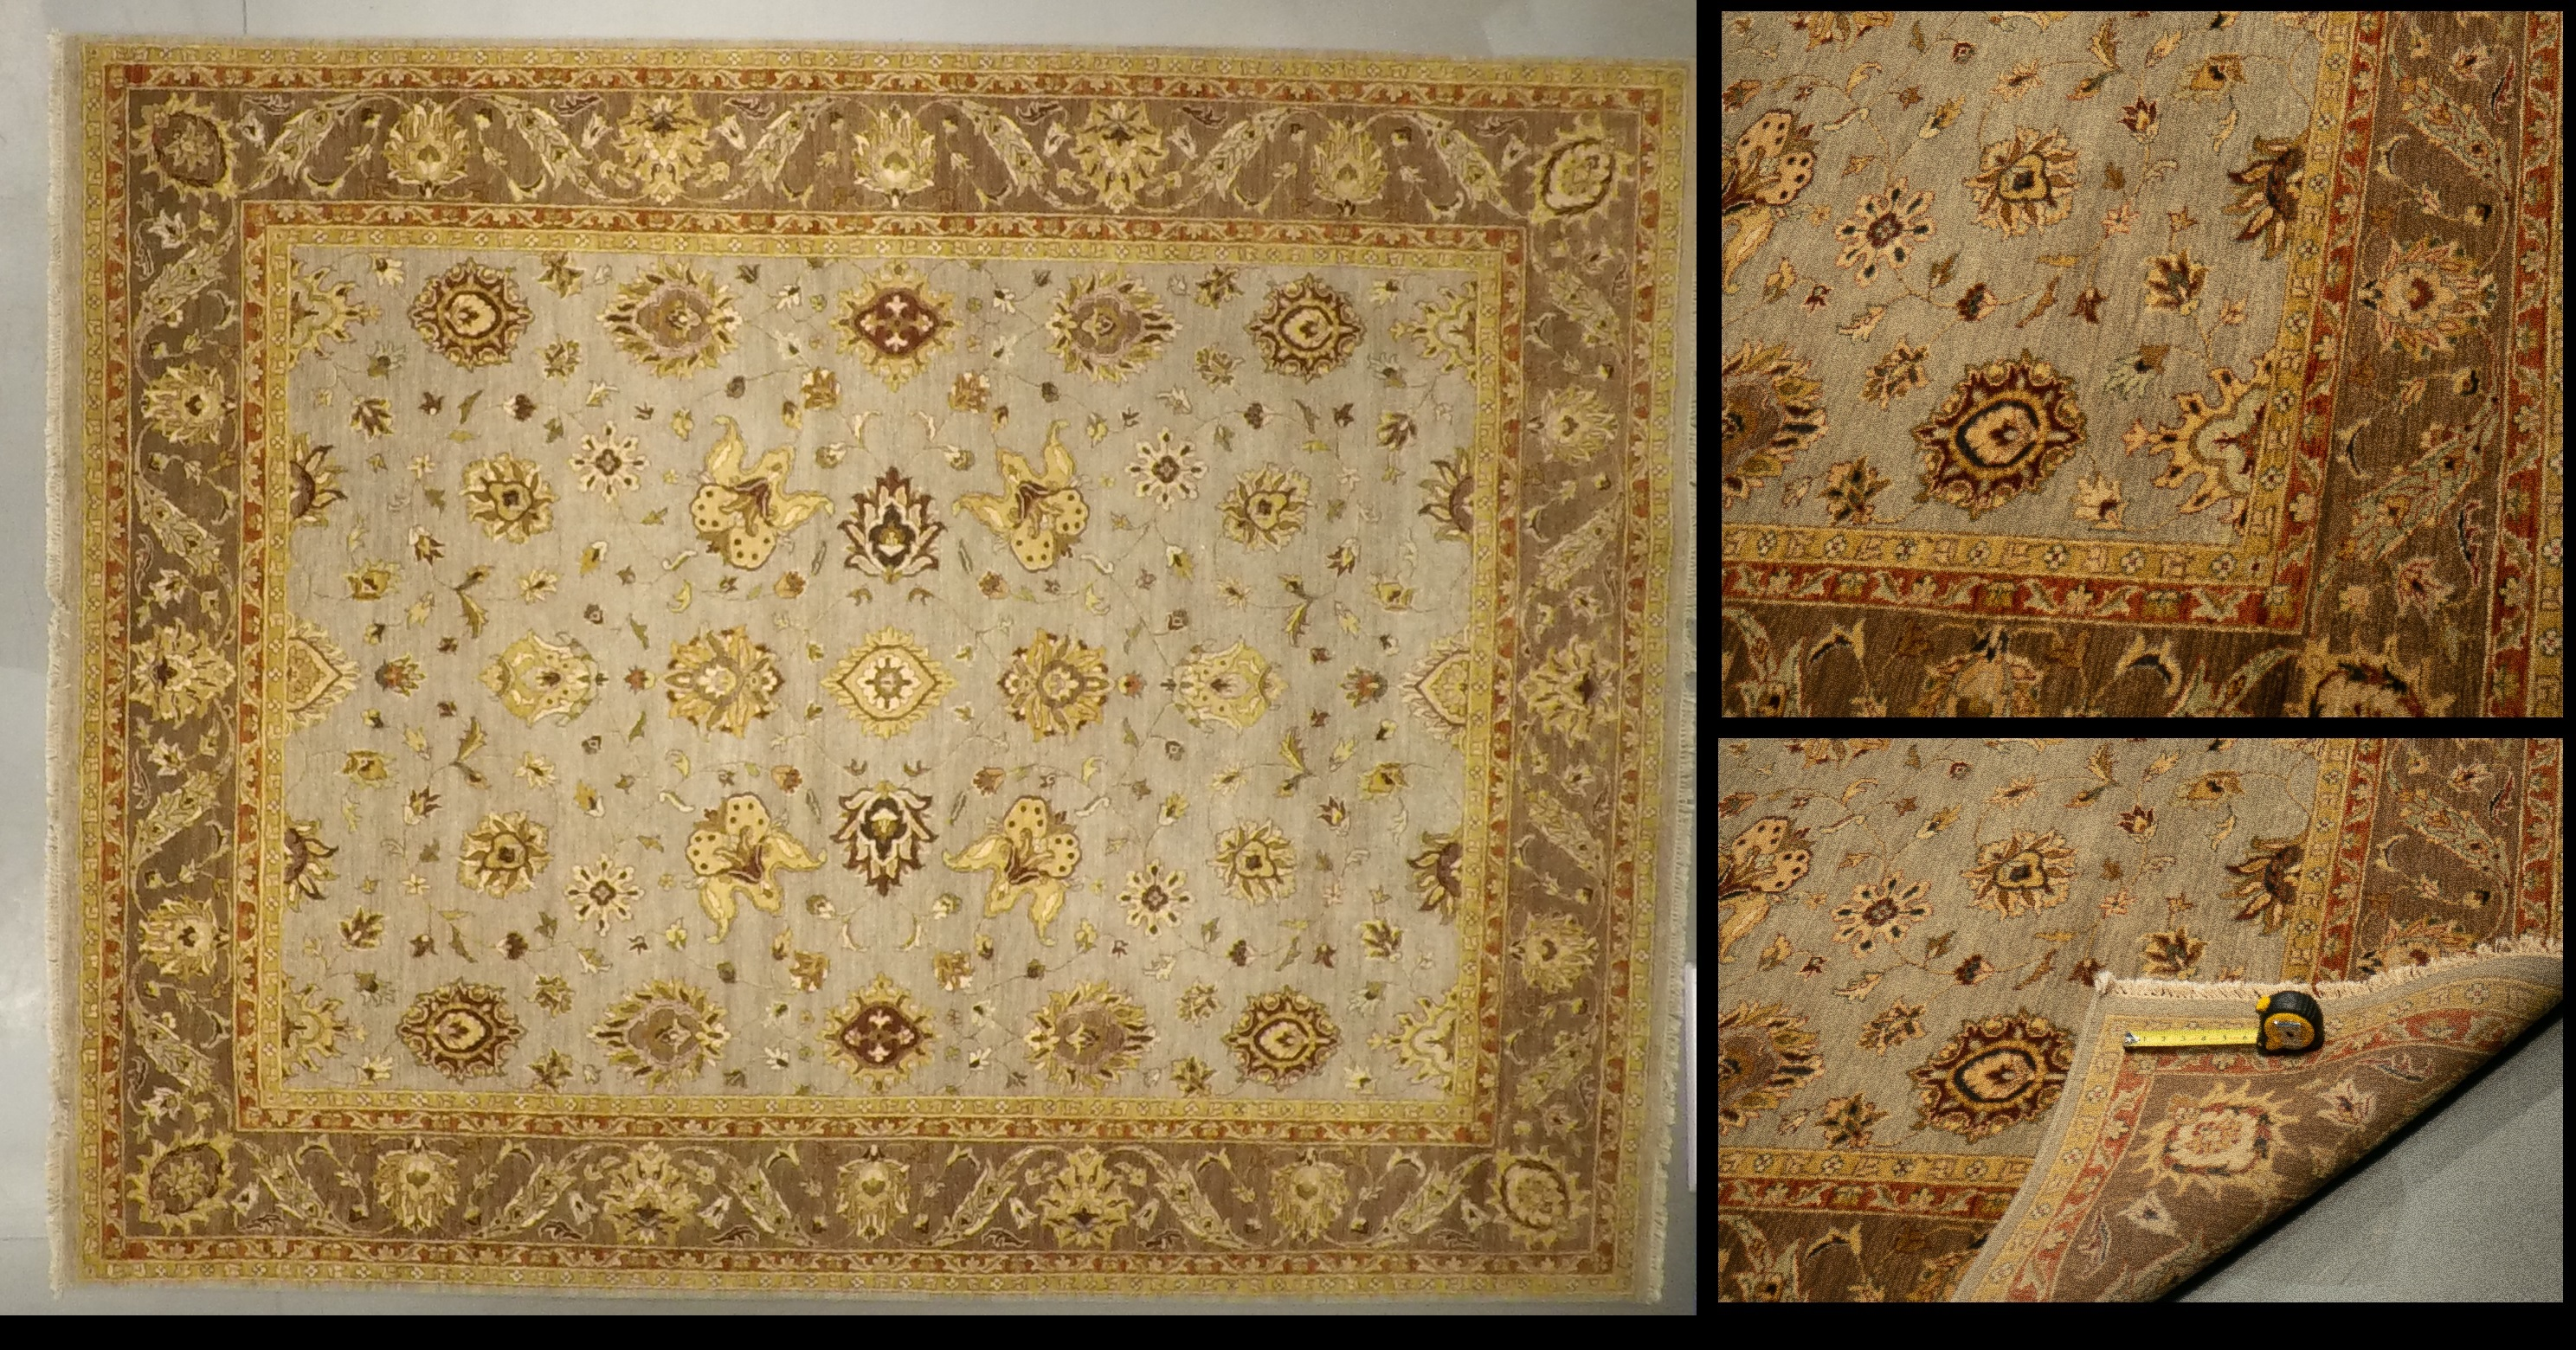 LD 68 3694 (7.10 x 10) Wool-Handmade